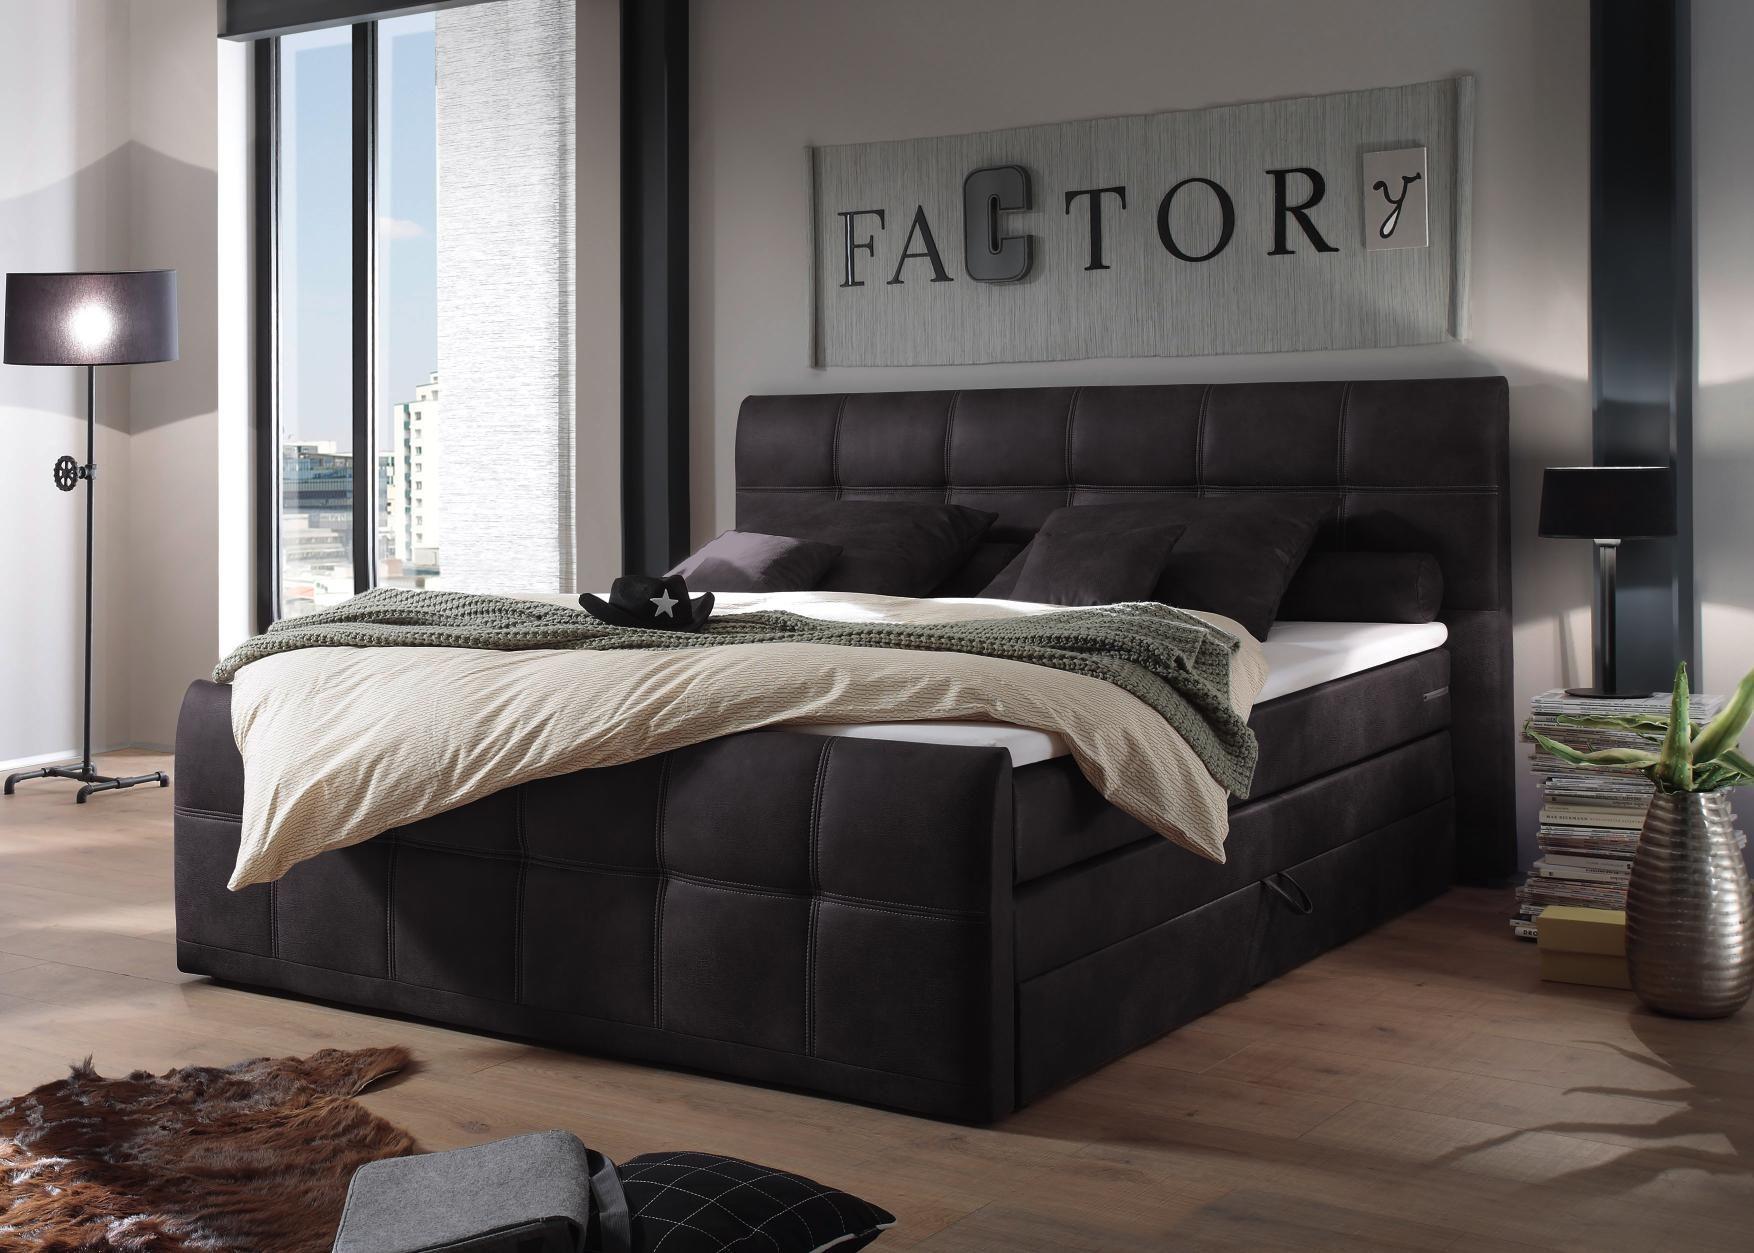 Lovely Schlafzimmer Mit Boxspringbett Braun #11: BOXSPRINGBETT 180 Cm X 200 Cm In Textil Anthrazit